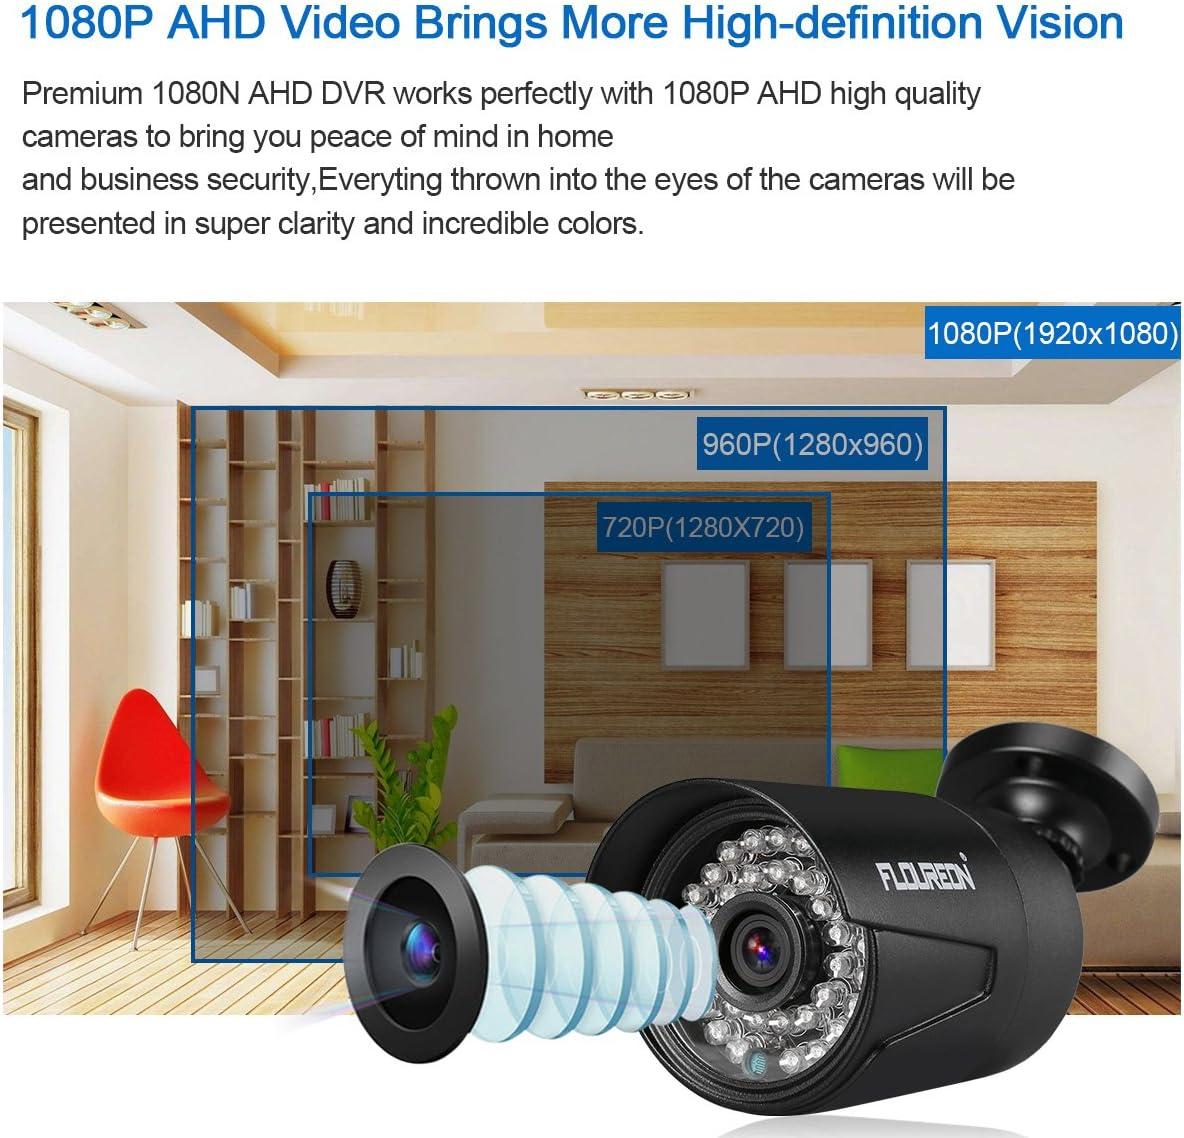 5-IN-1 8CH 1080P 1080N AHD DVR+4X 3000TVL 1080P 2MP Camera Security Kit+1TB HDD